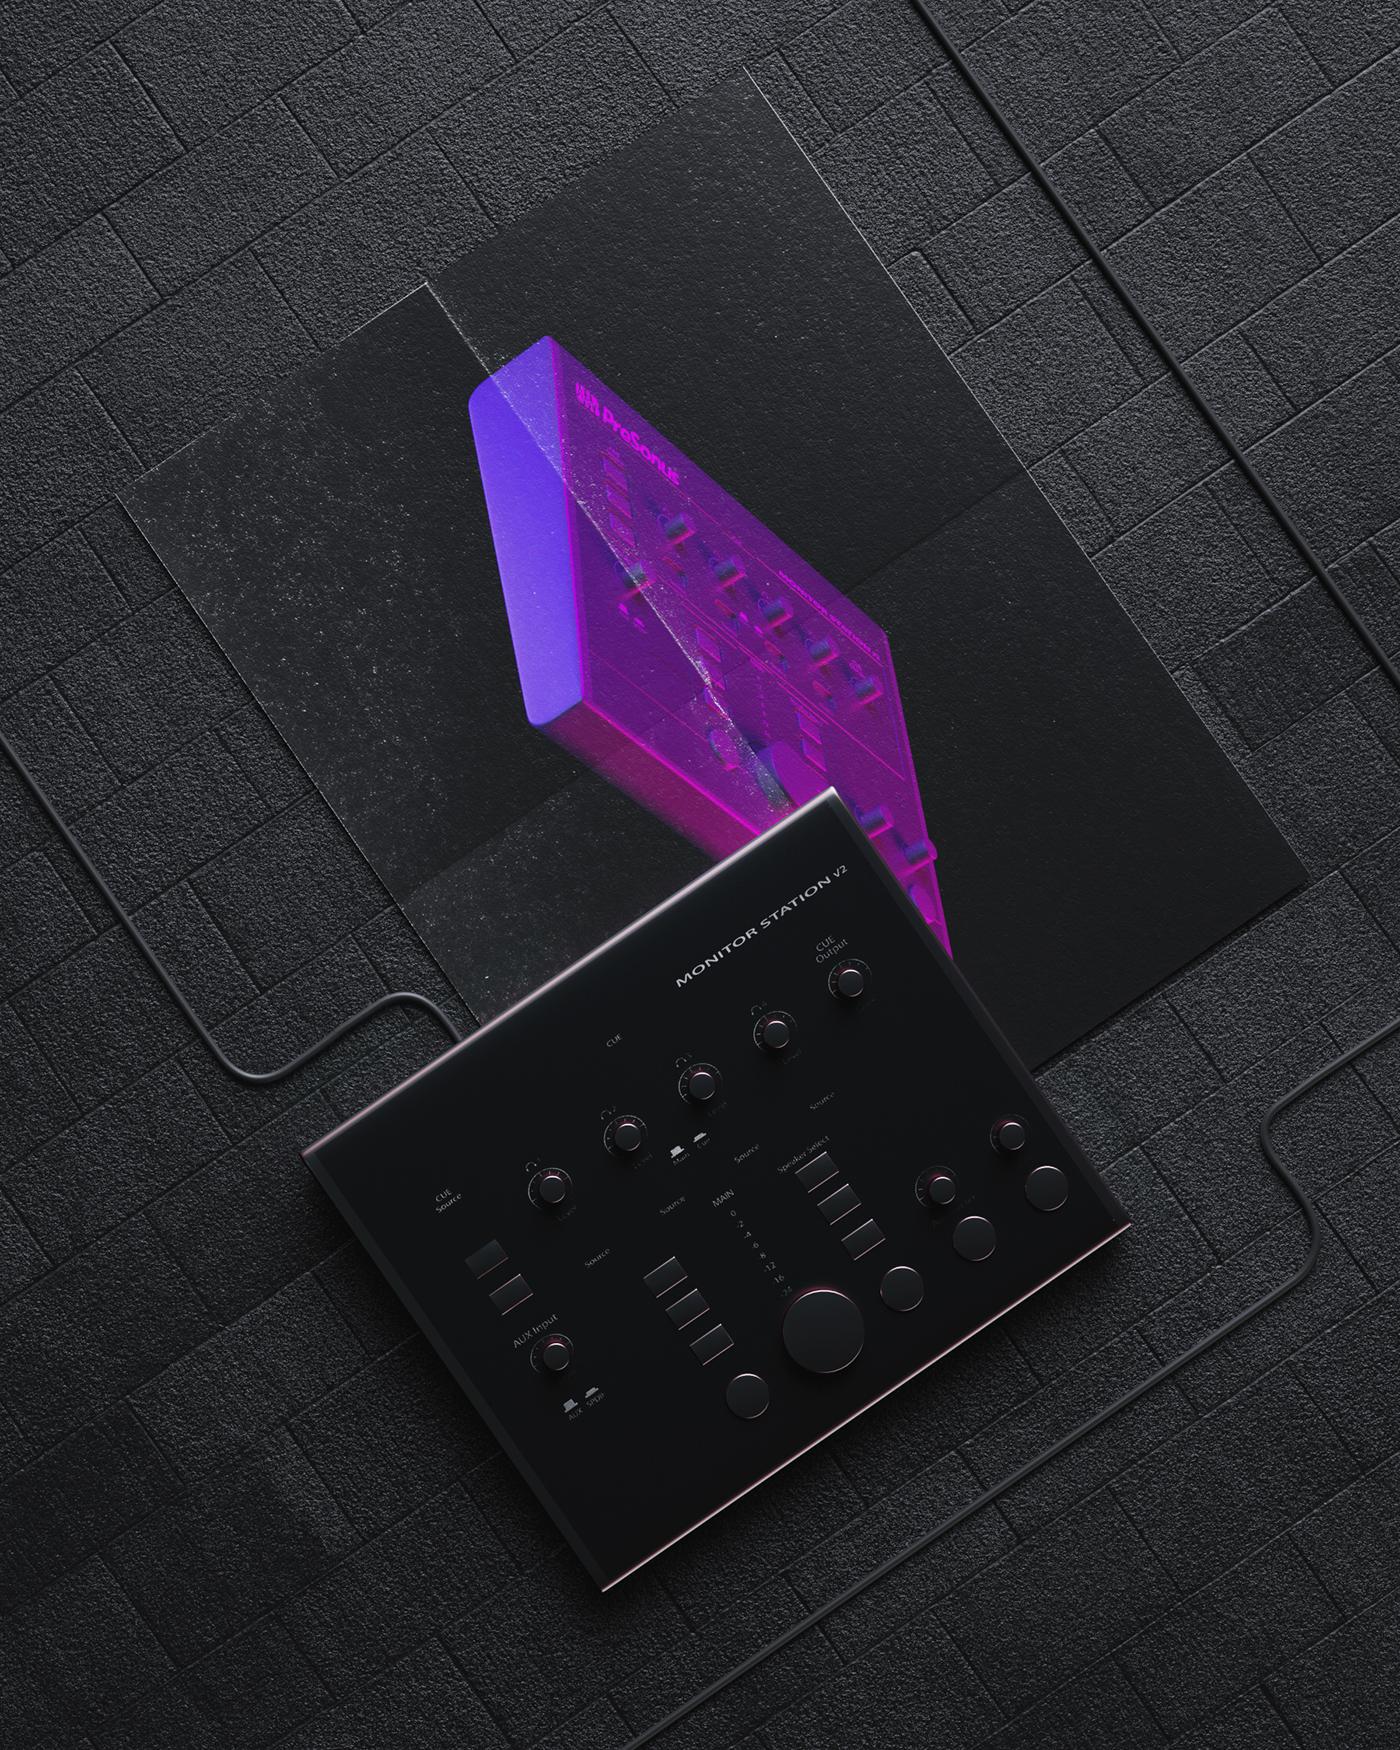 3D CGI octane c4d Audio video Editing  workstation black magenta